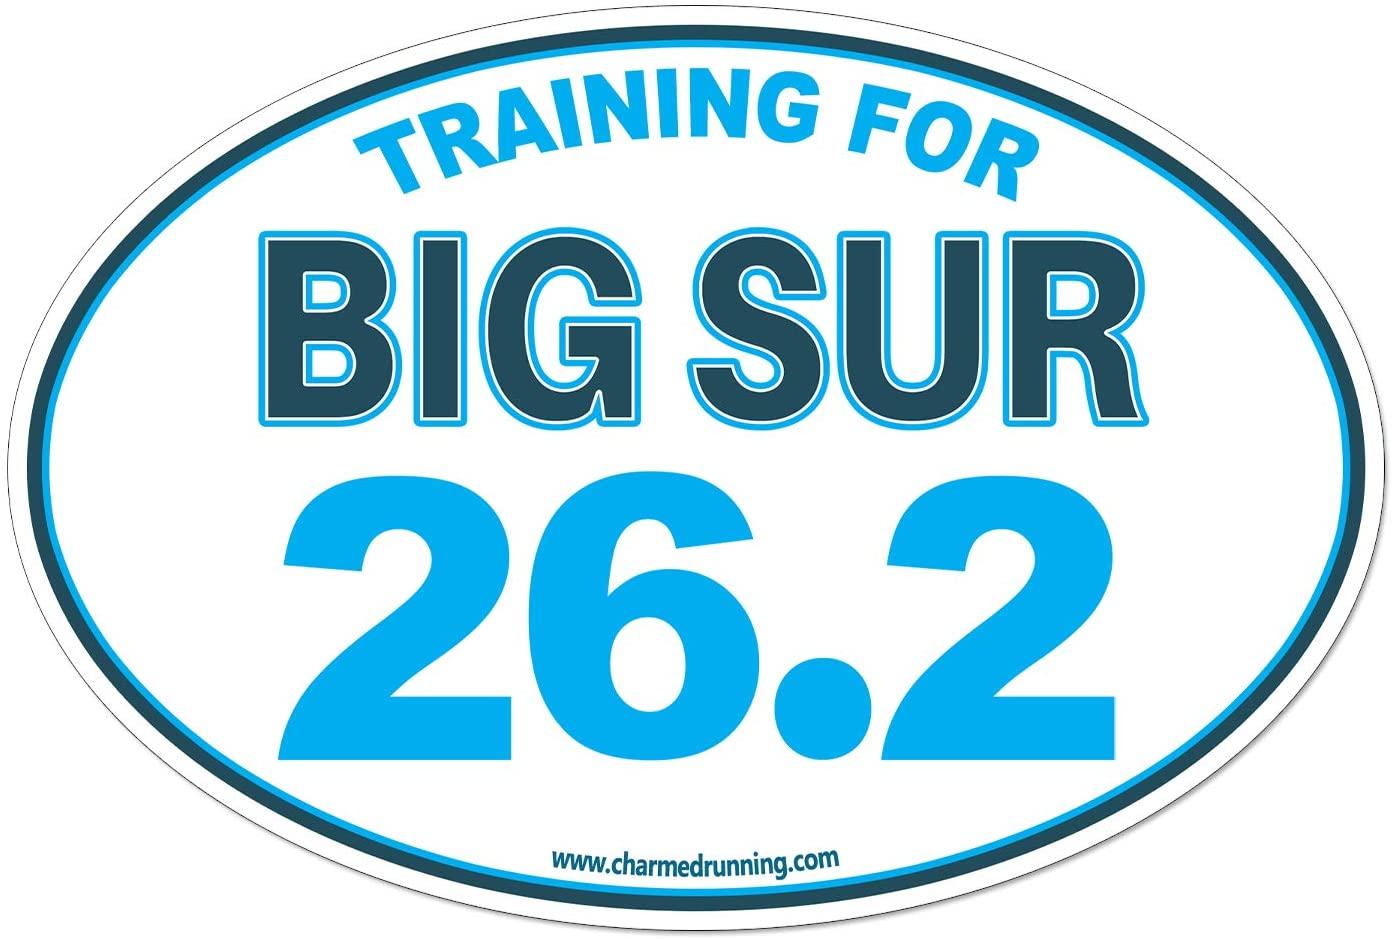 Charmed Running Training For Big Sur Marathon 26.2 Car Magnet